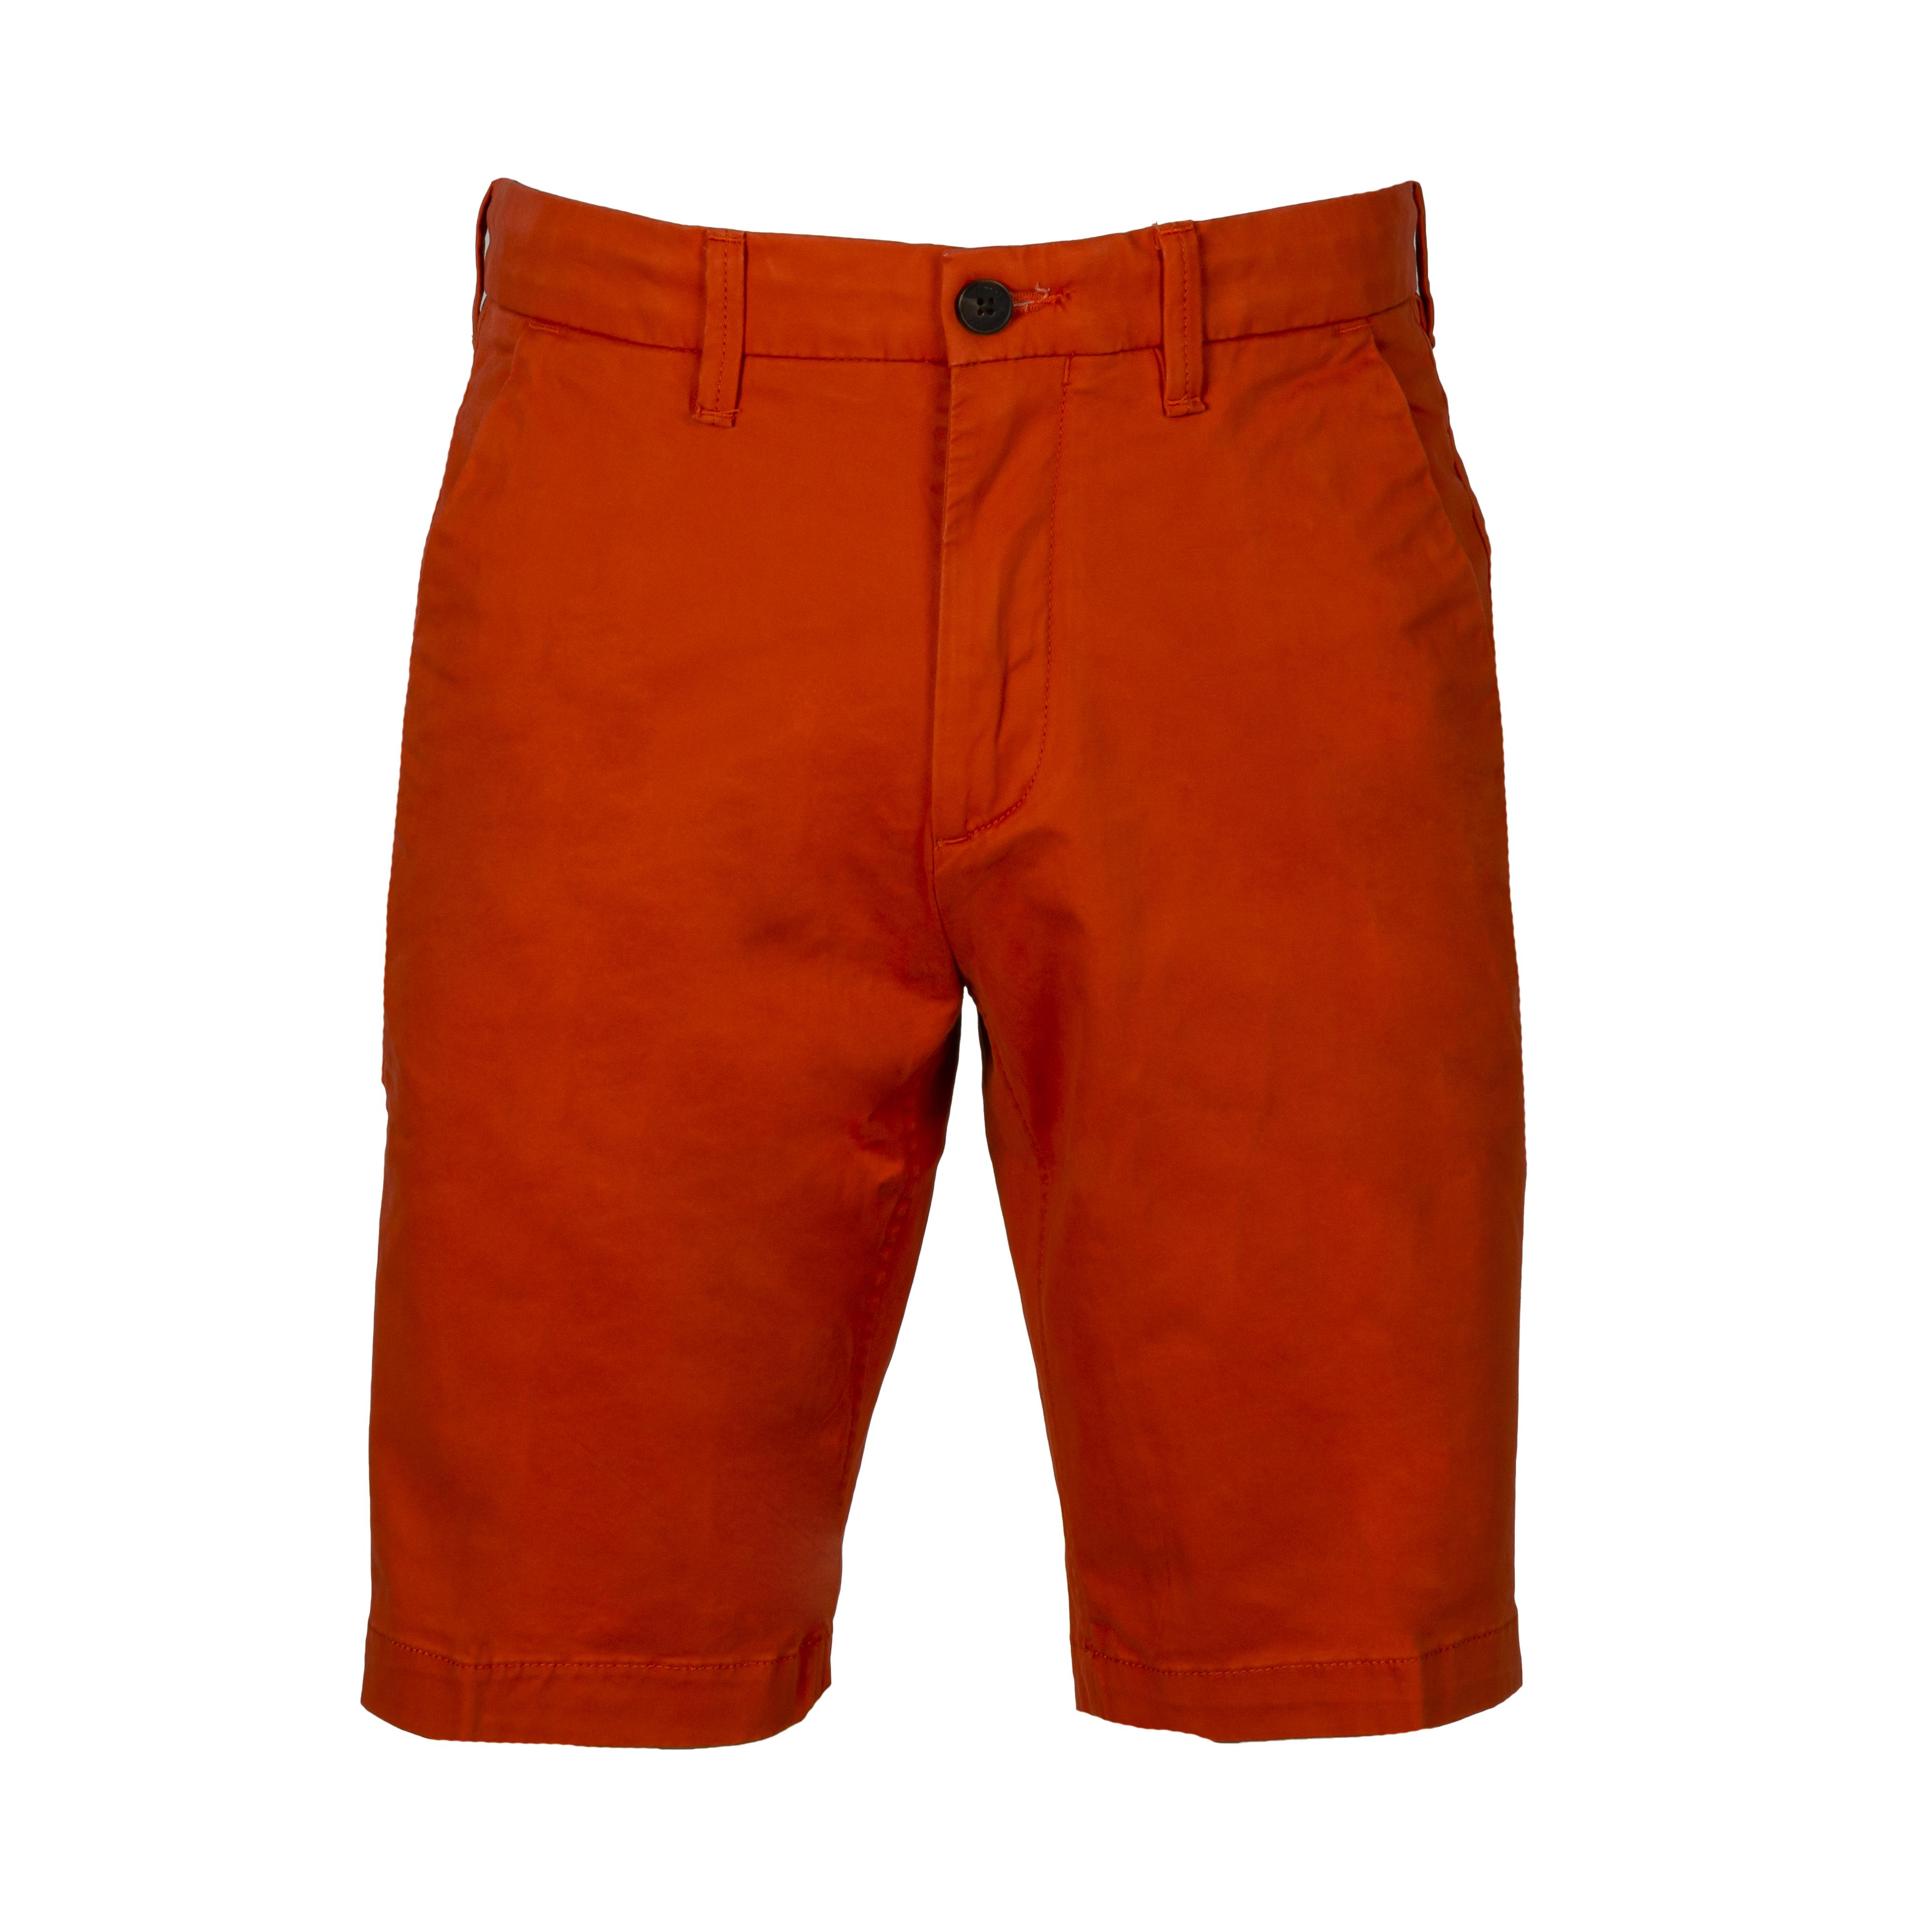 Bermuda  chino en coton stretch orange